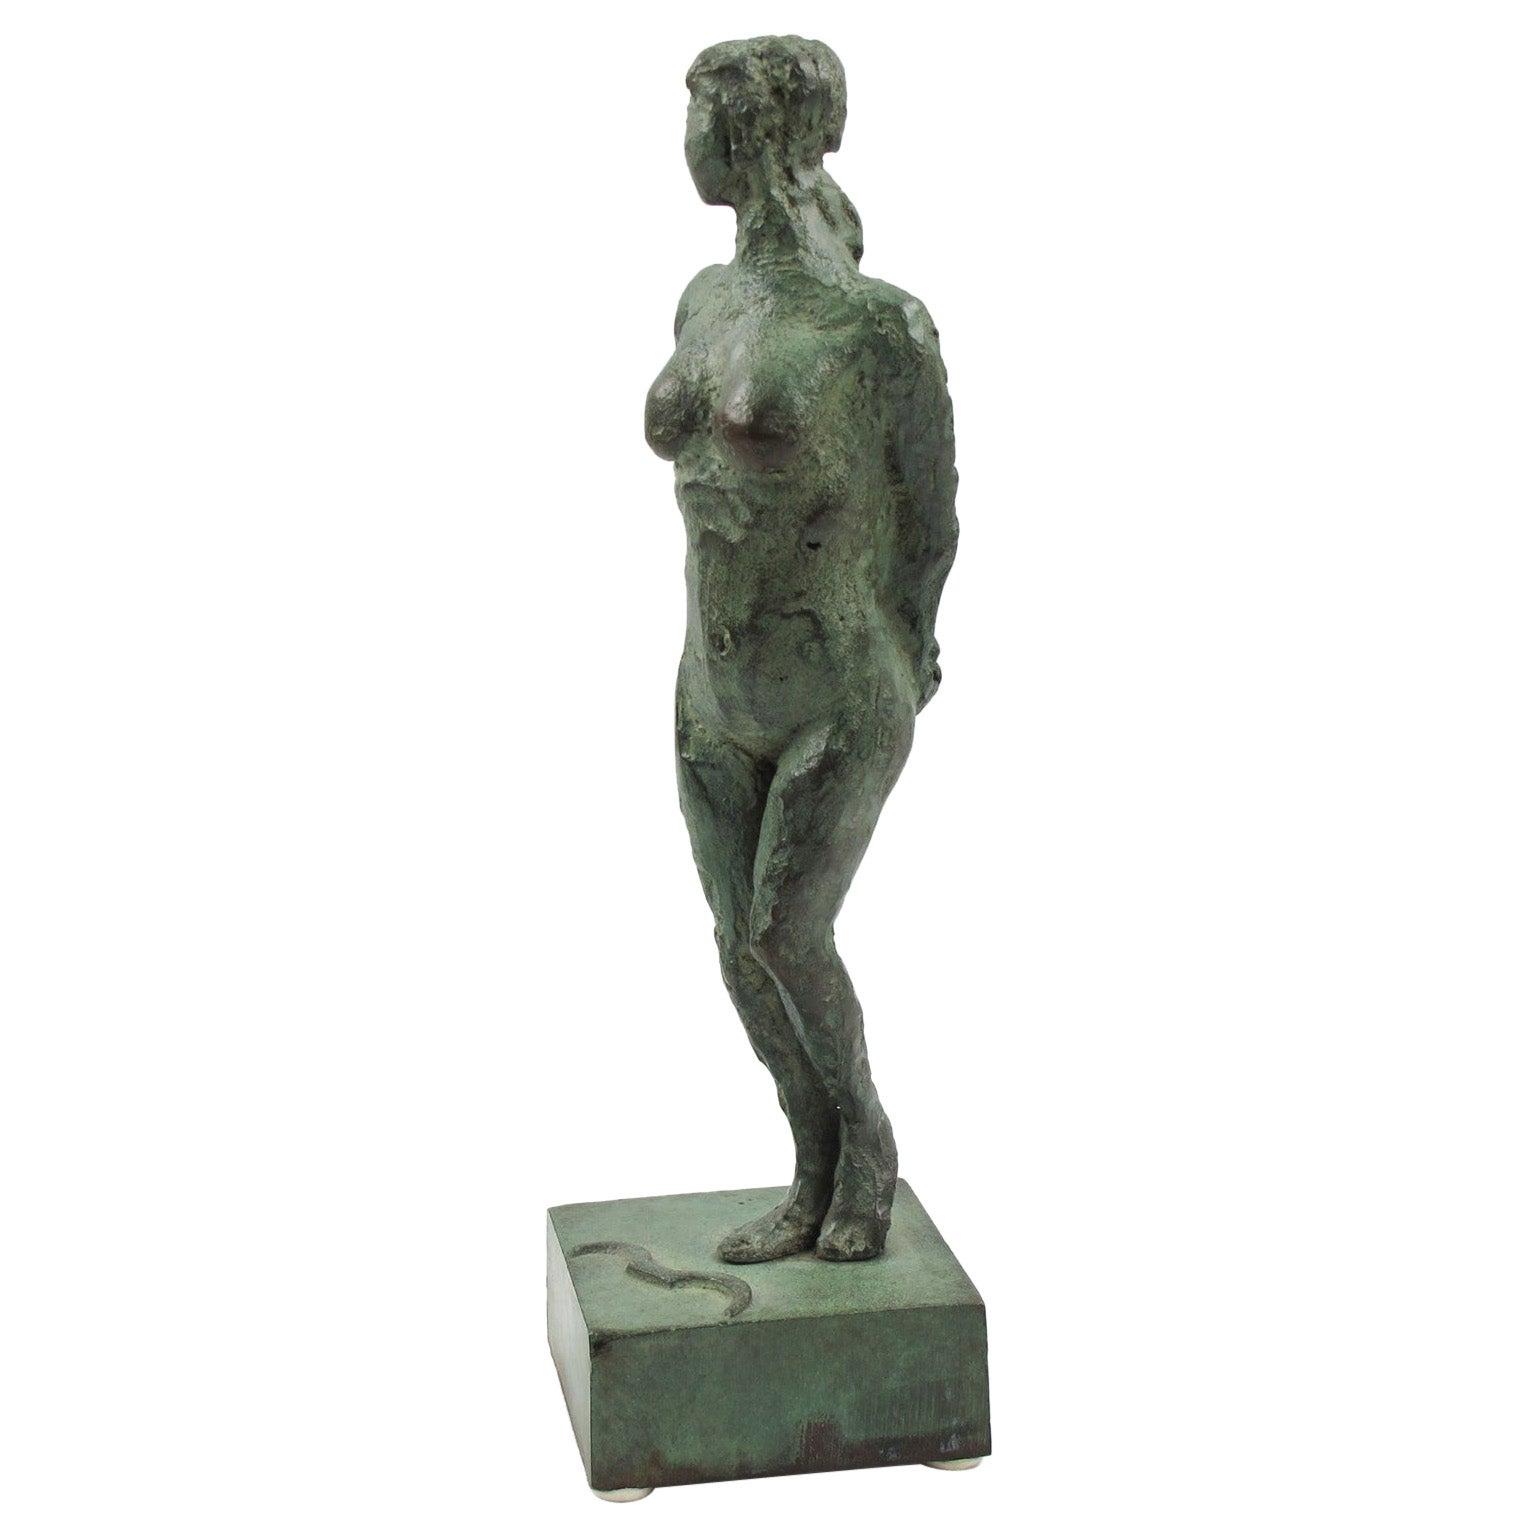 Art Deco Bronze Sculpture Artemis Diana the Huntress